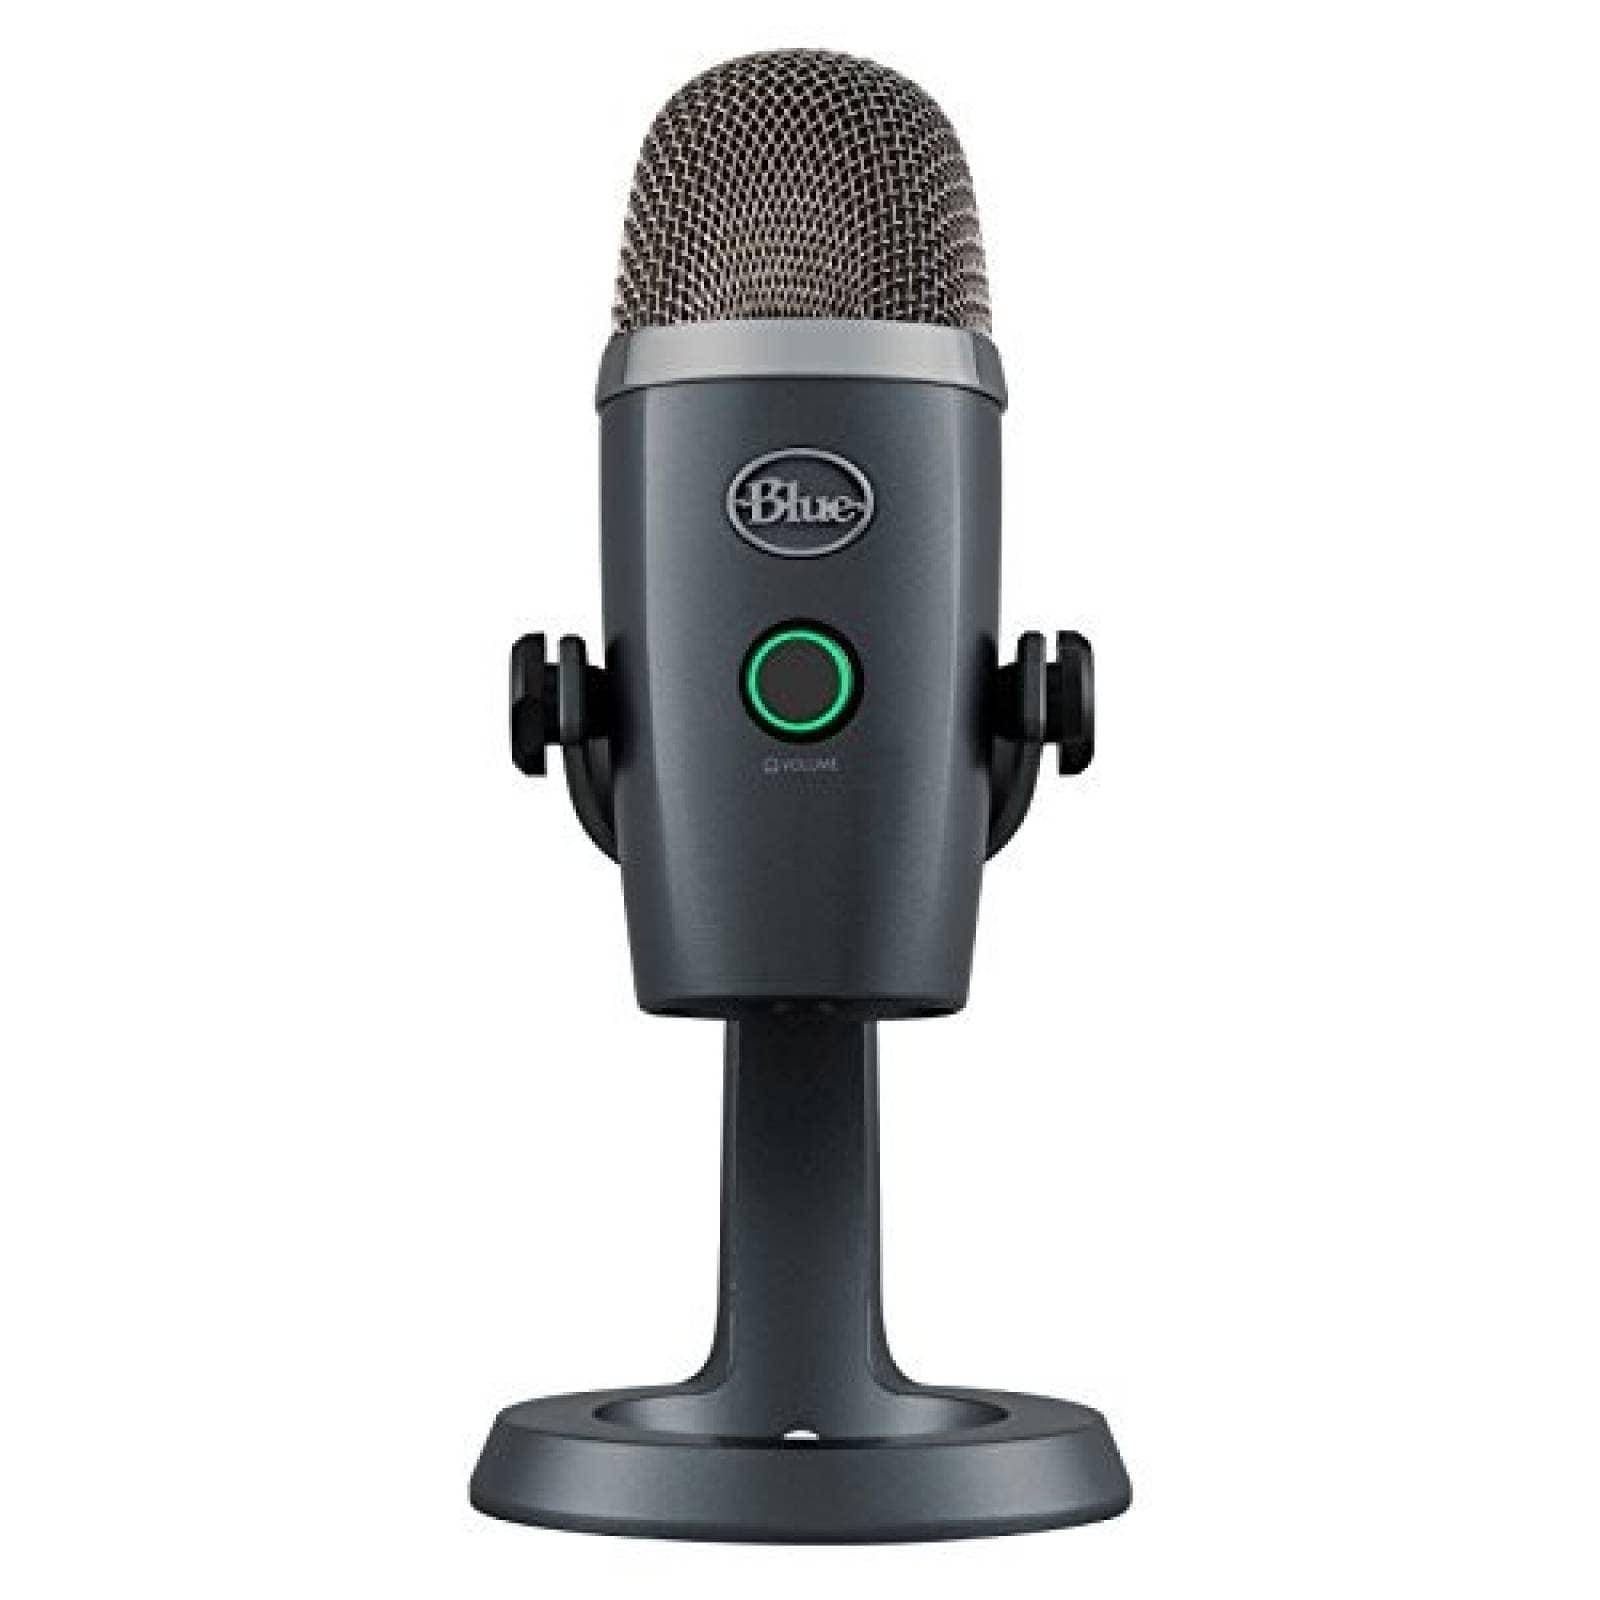 Micrófono Blue Yeti Nano Premium USB Streaming -Gris